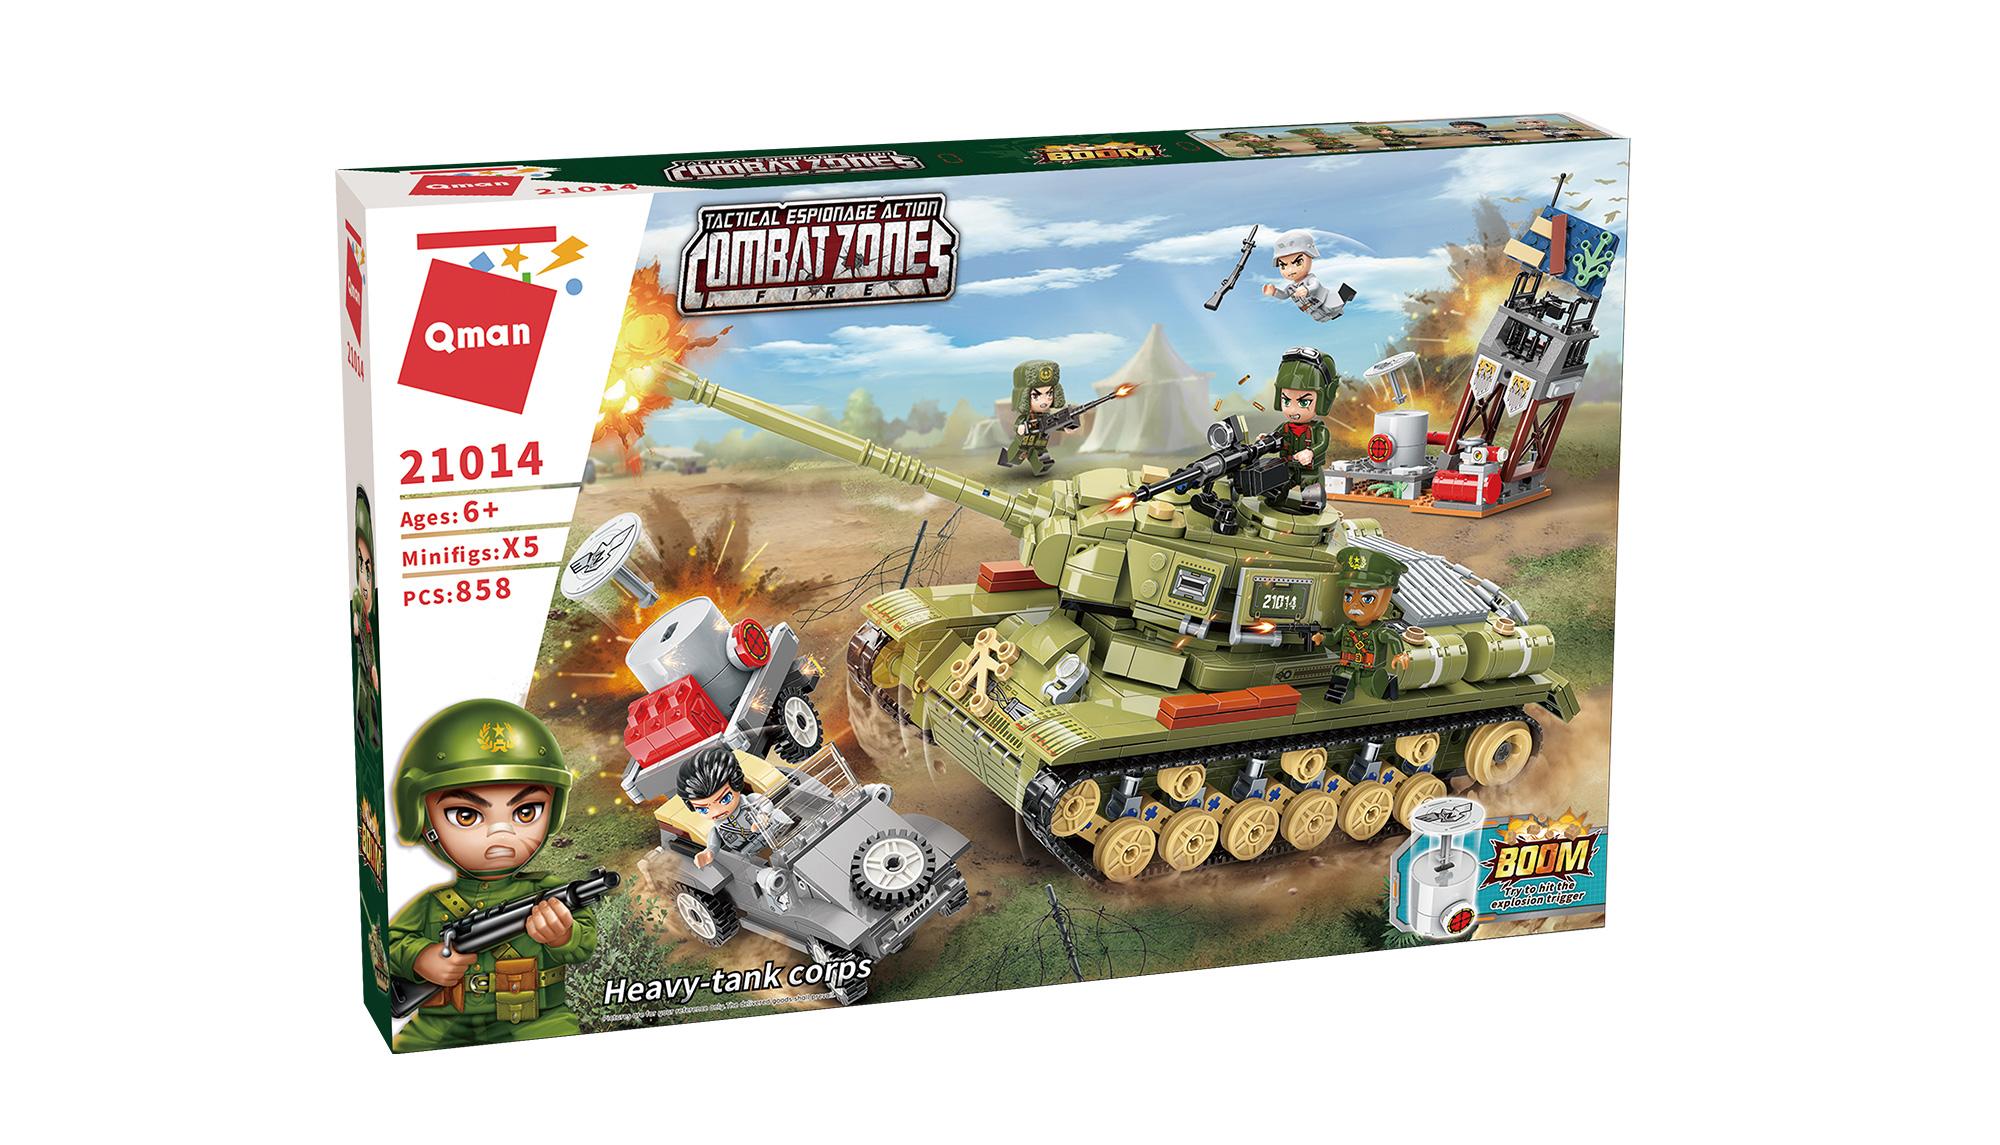 Qman Combat Zone 21014 Tankový sbor